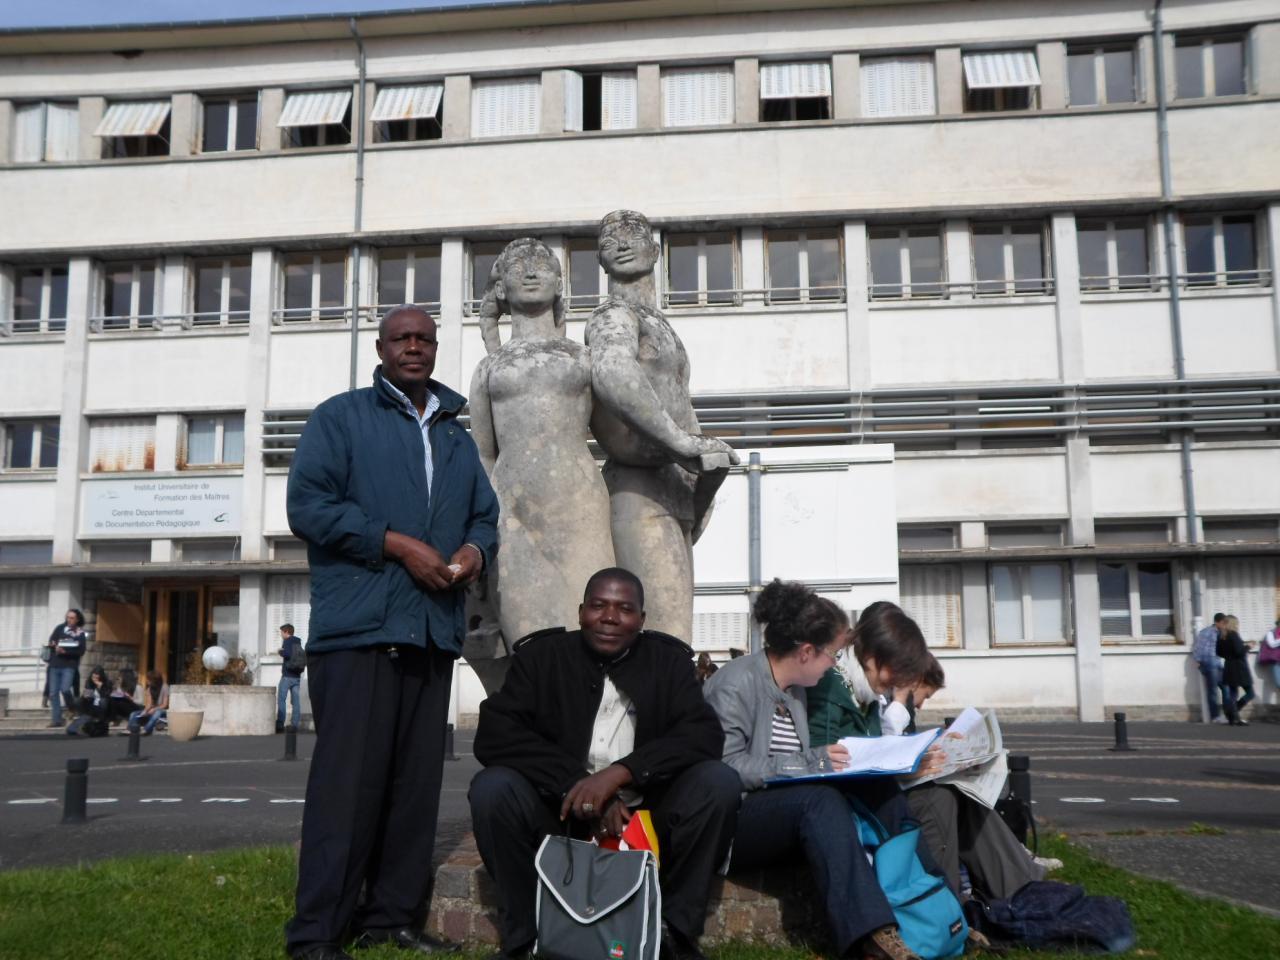 Devant l'IUFM du Cantal ( Institut de formation des maîtres)